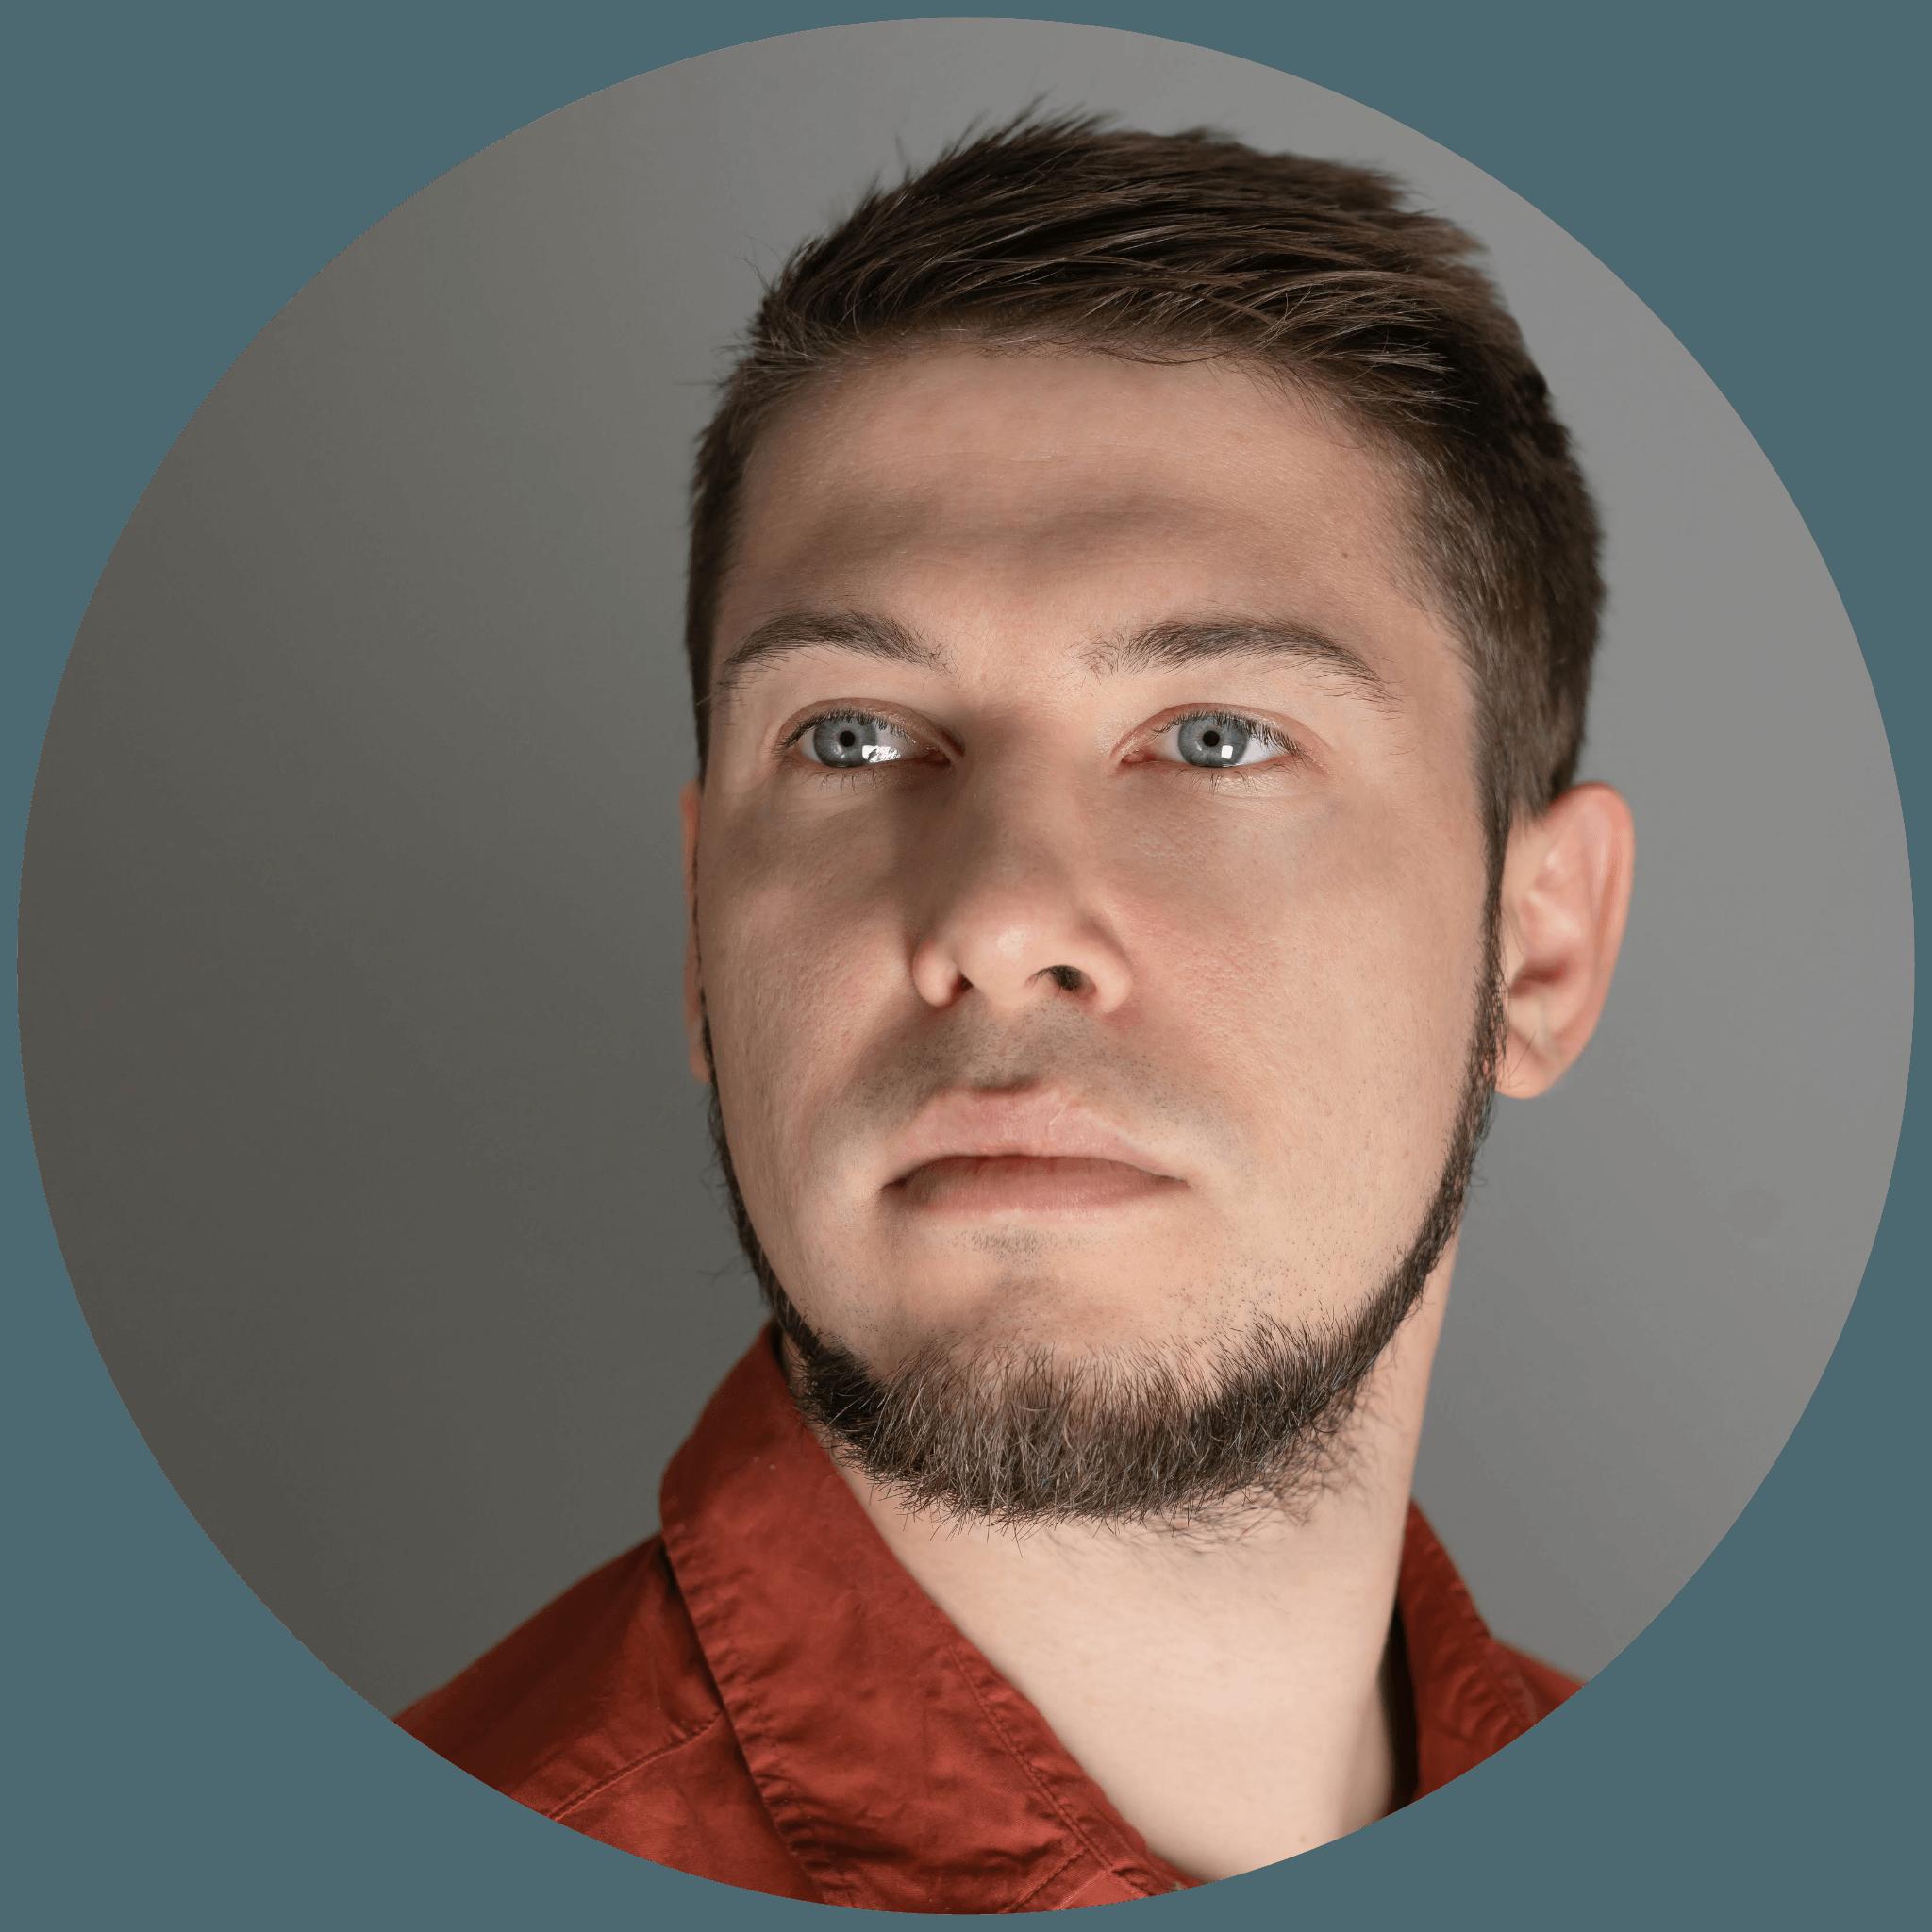 Ingmar_Konnow_weltfern_interactive_01